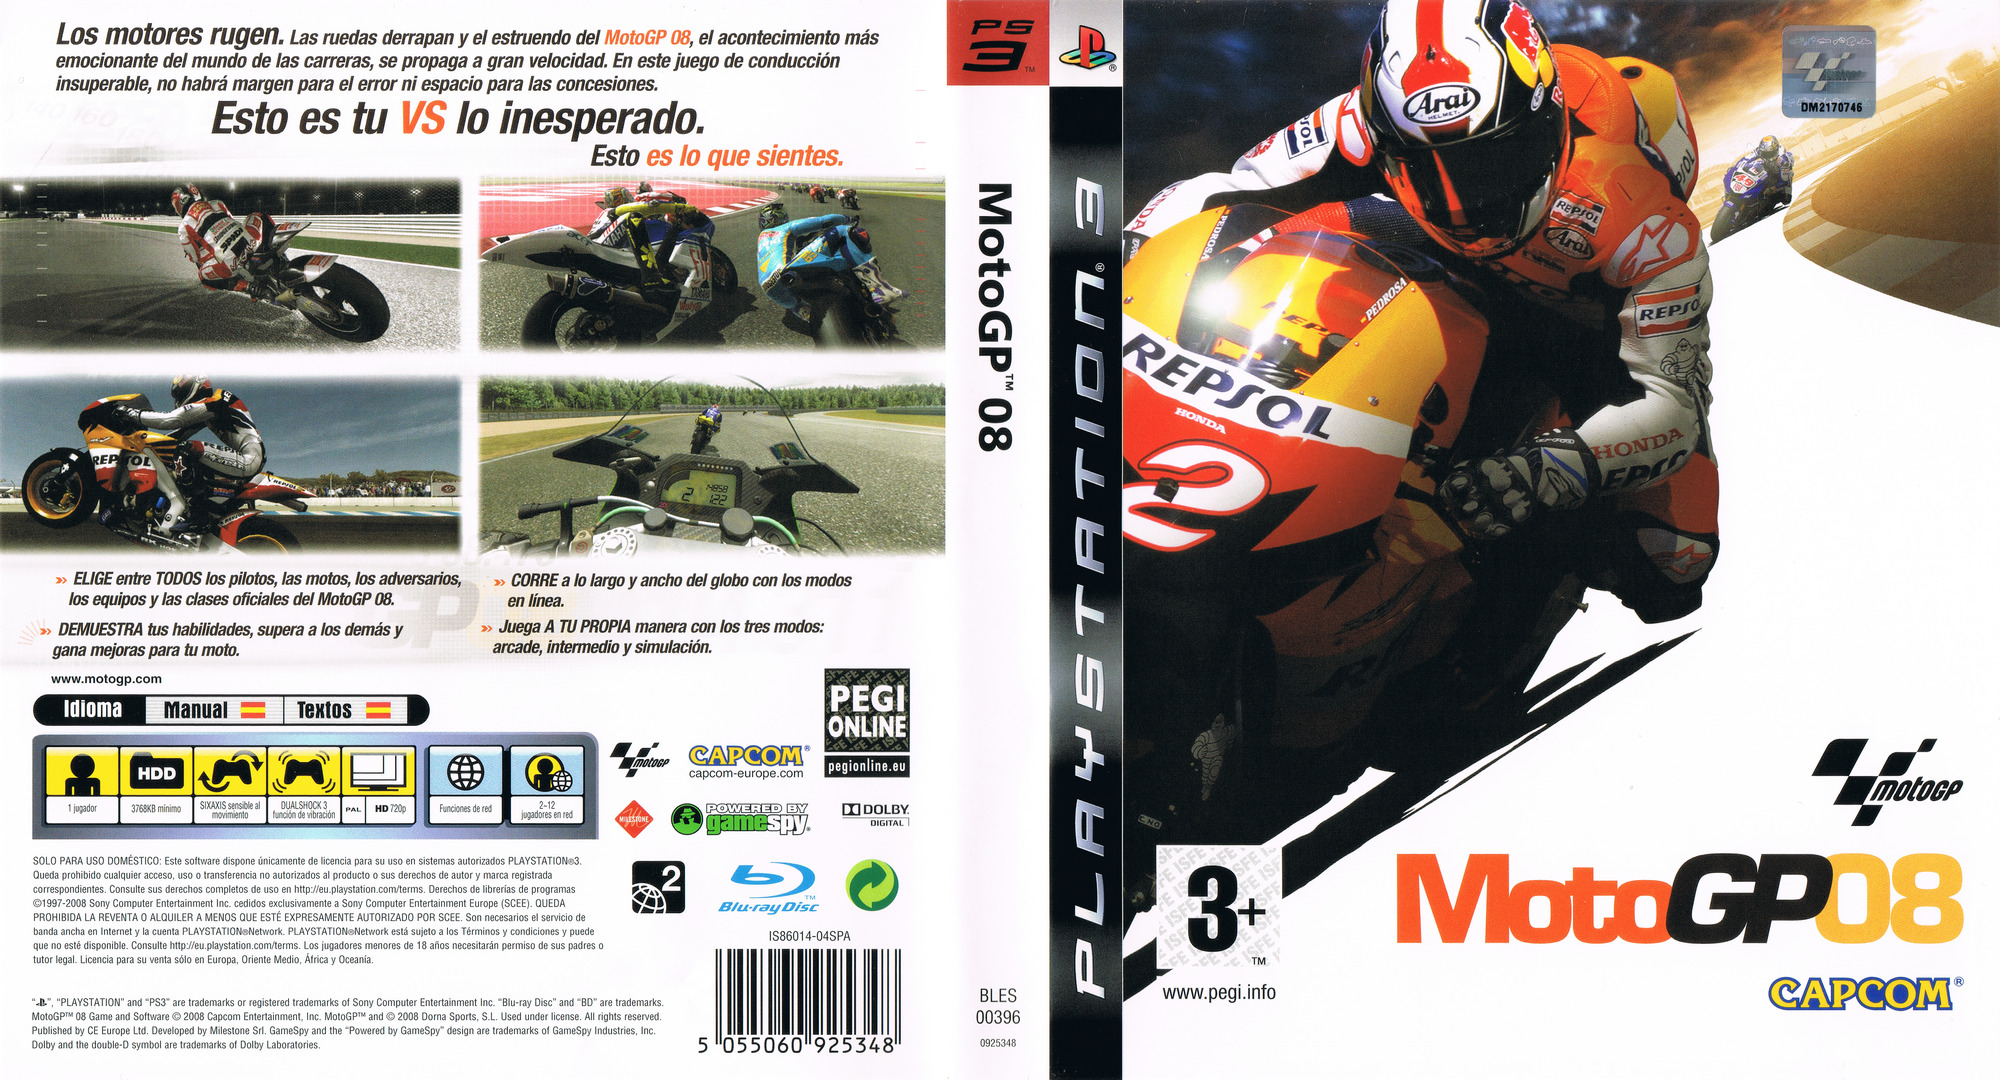 MotoGP 08 PS3 coverfullHQ (BLES00396)